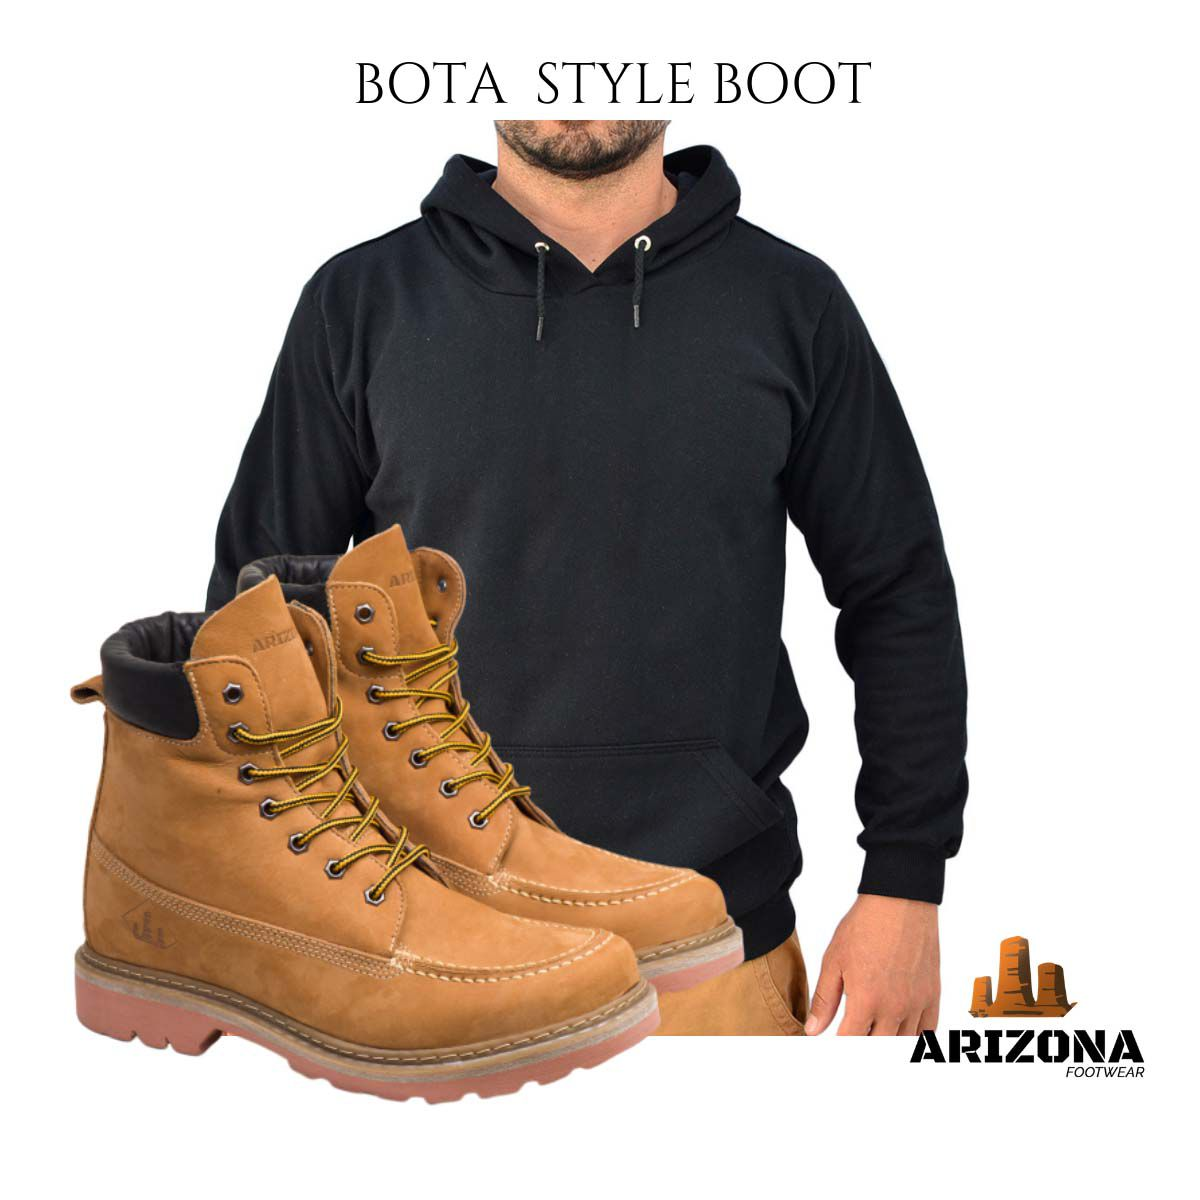 Bota Coturno Adventure Arizona Canyon Boot  Moleton Liso Preto